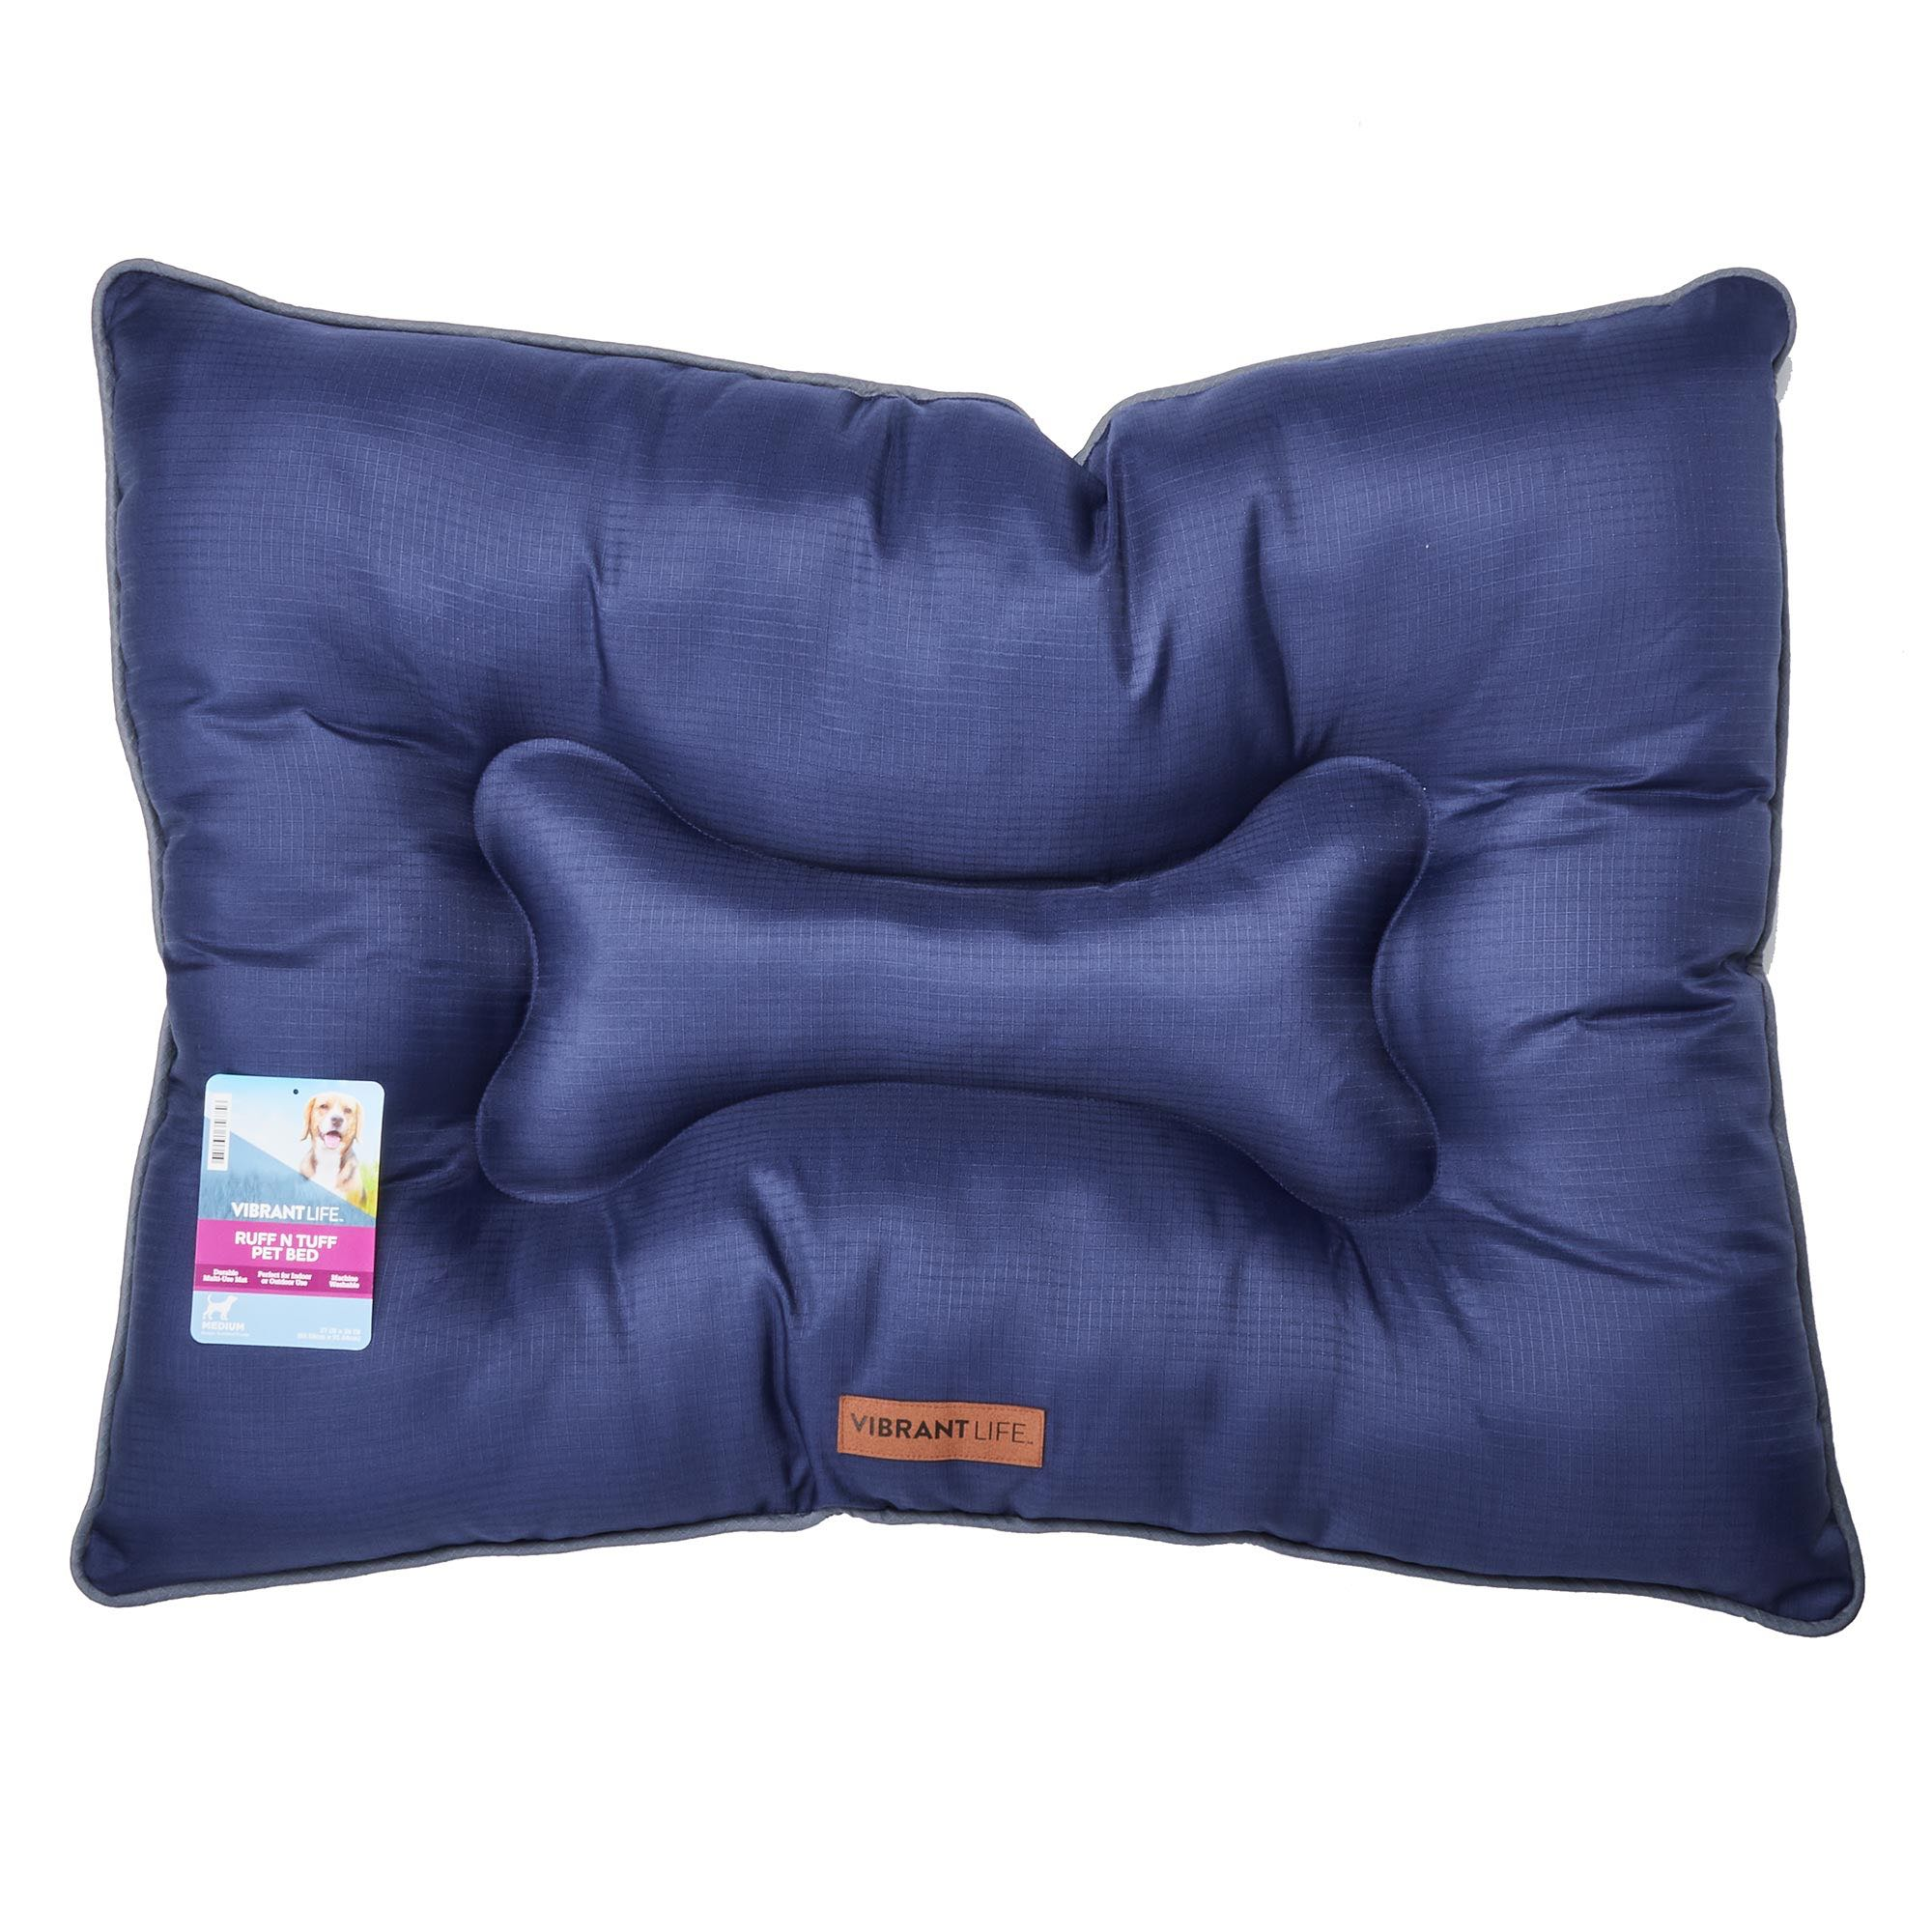 Vibrant Life 27 X 36 Ruff N Tuff Indoor Outdoor Durable Pet Bed Medium Navy Walmart Com Walmart Com